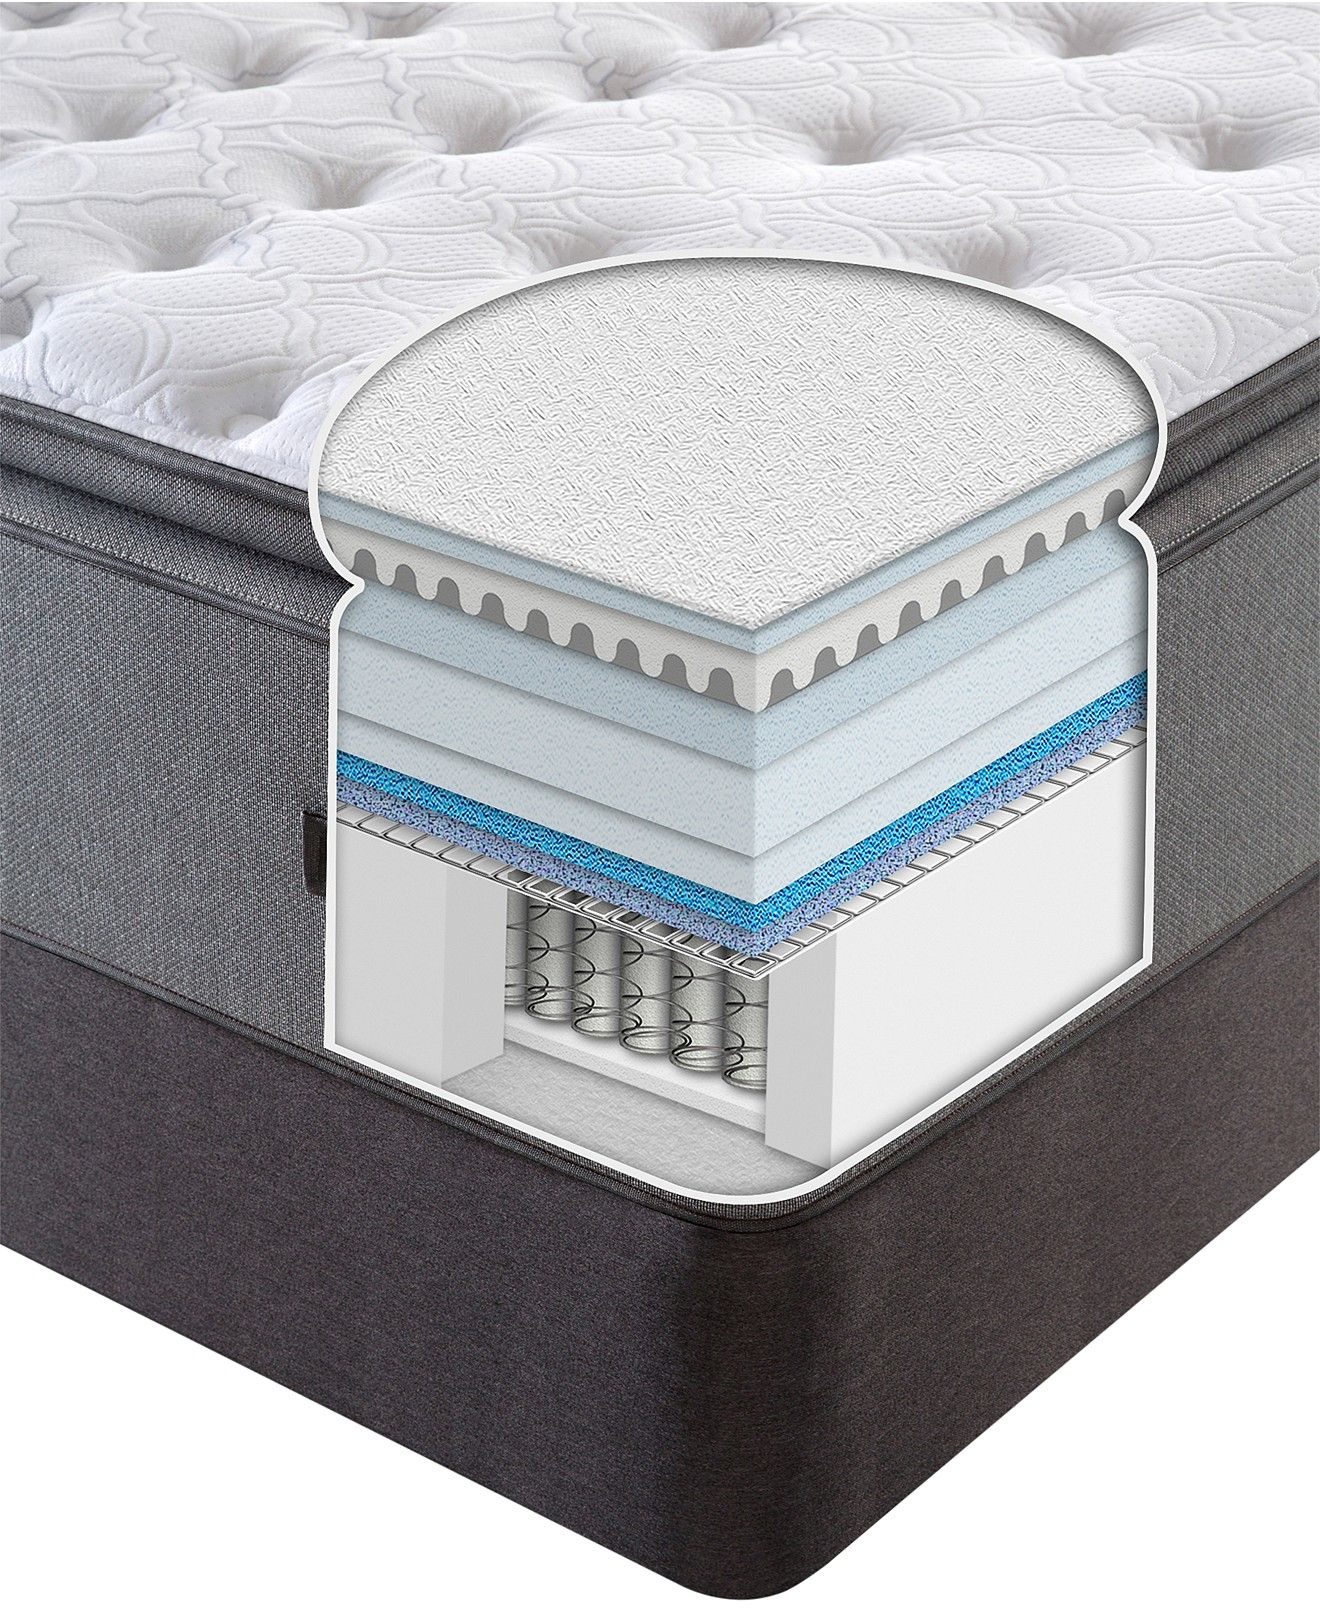 Sealy Posturepedic Market Street Plush Euro Pillowtop Queen